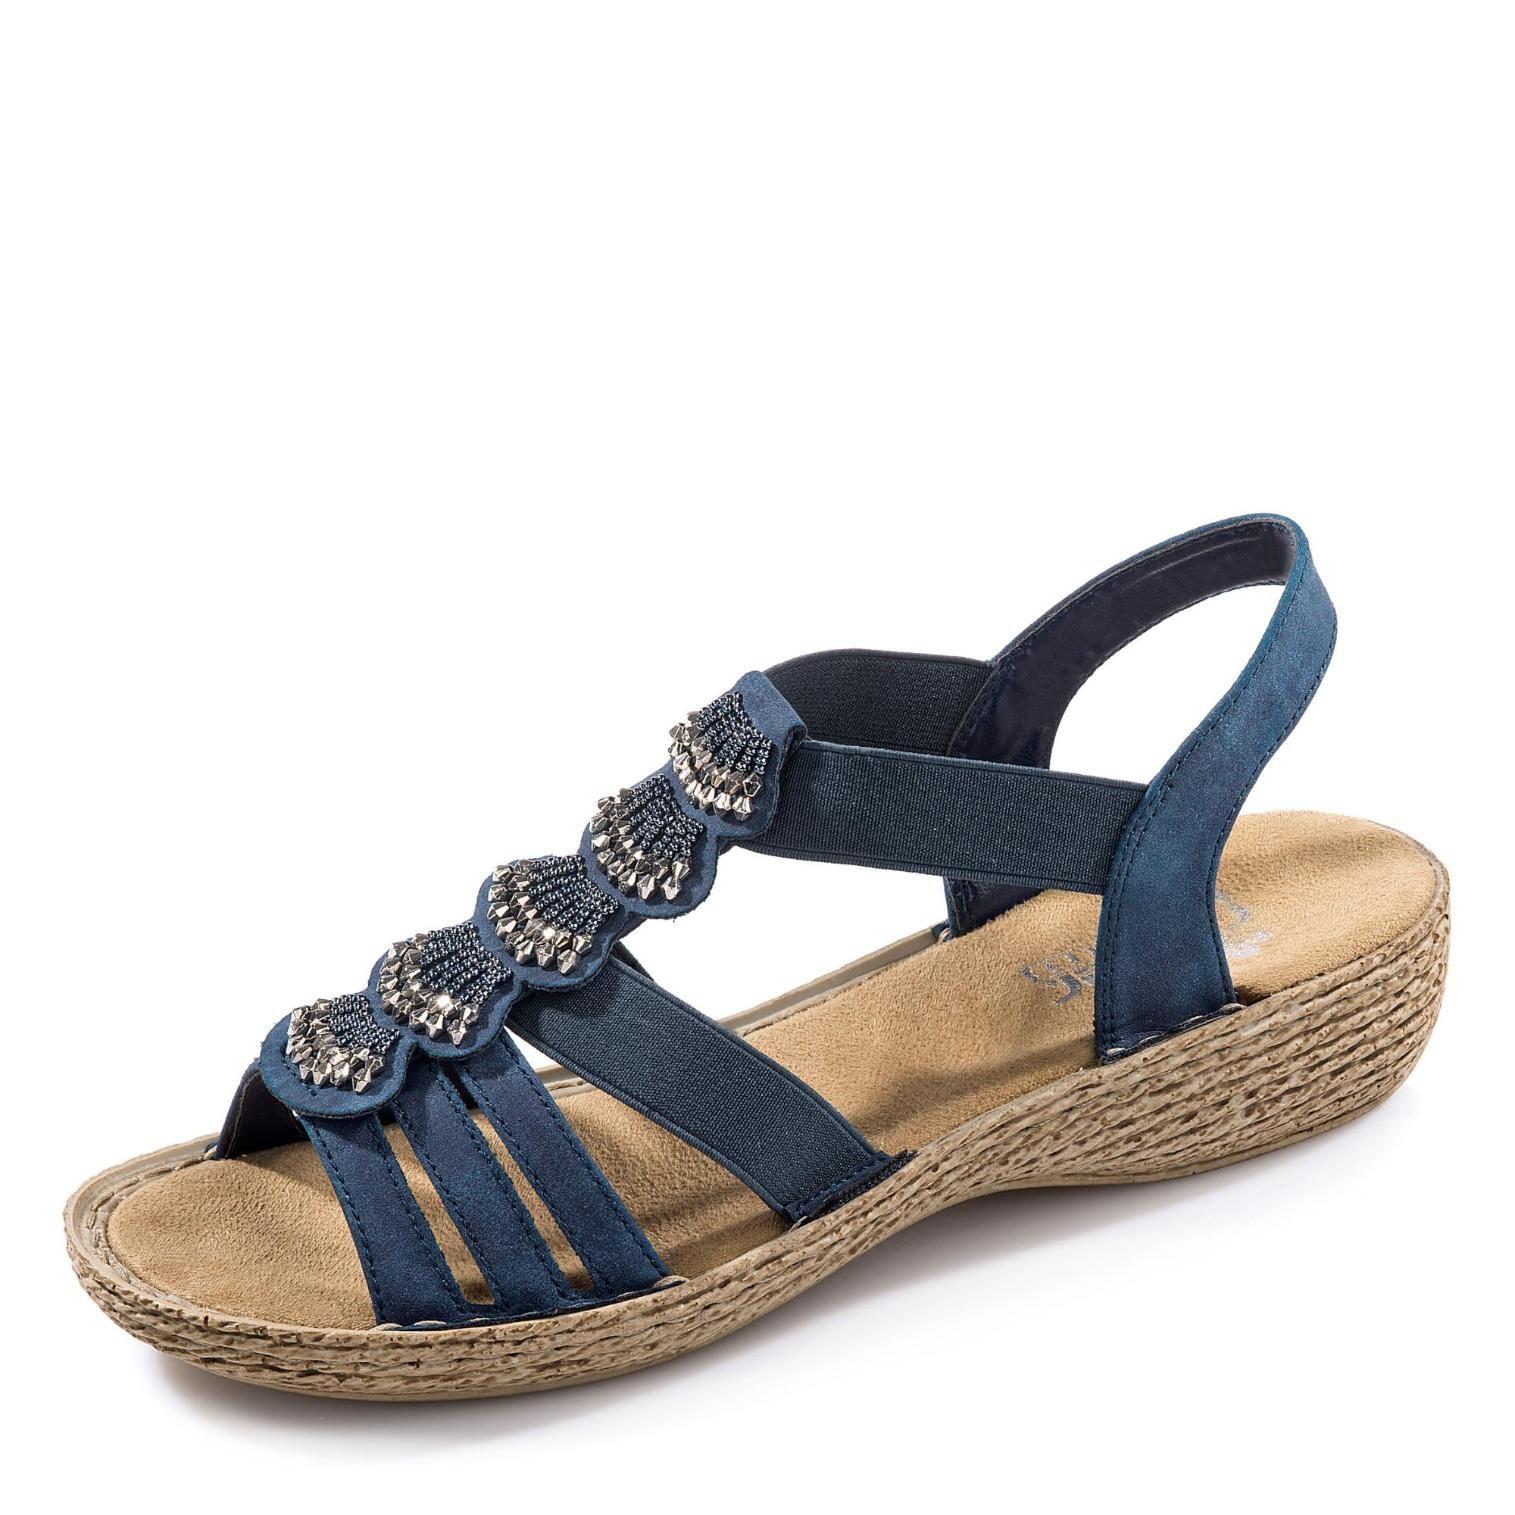 Rieker Sandale | caterlieschen in 2019 | Rieker sandalen